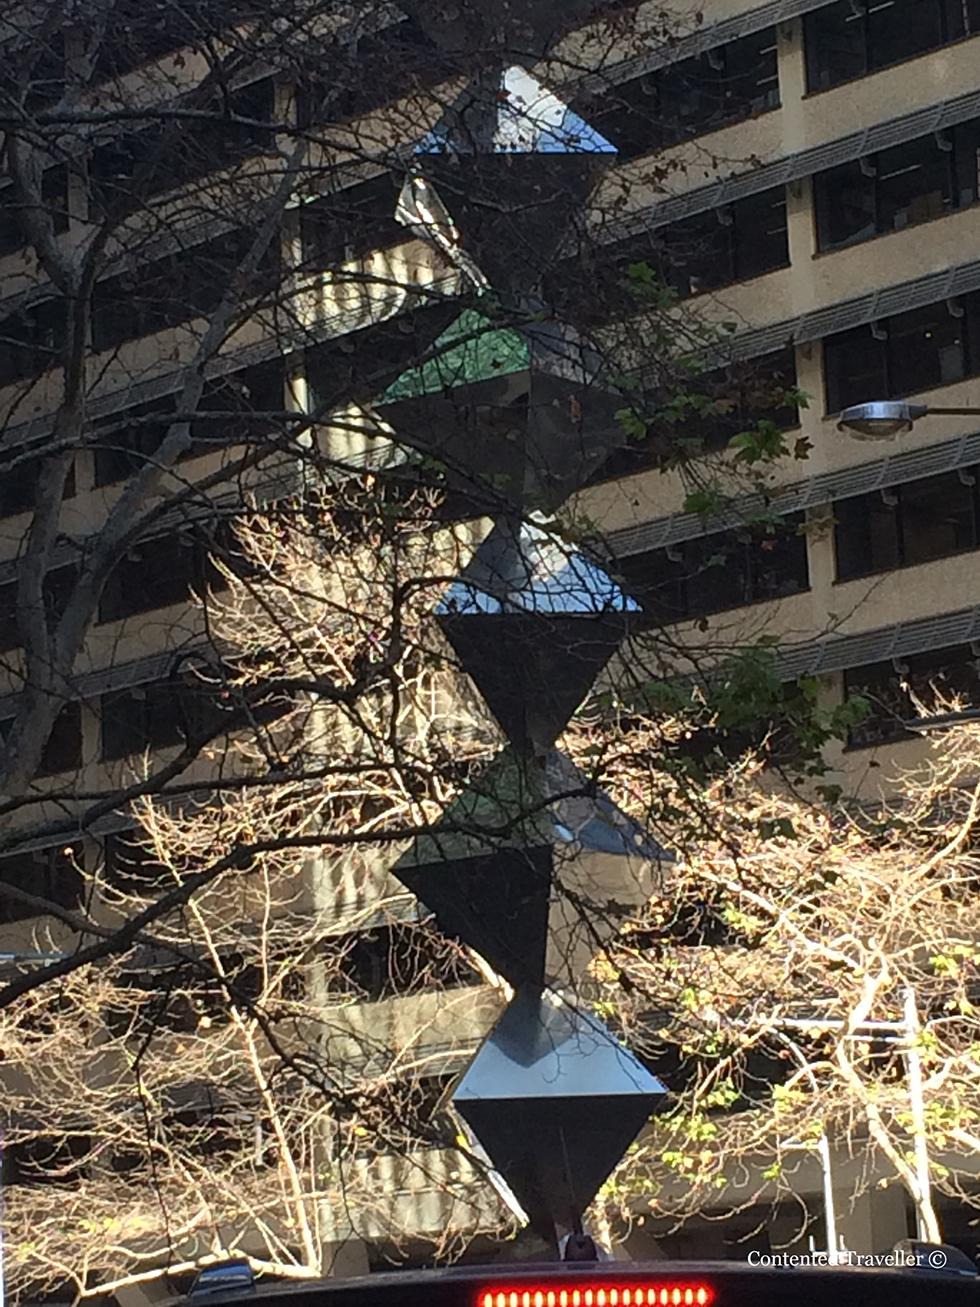 Sydney walkabout - photo essay